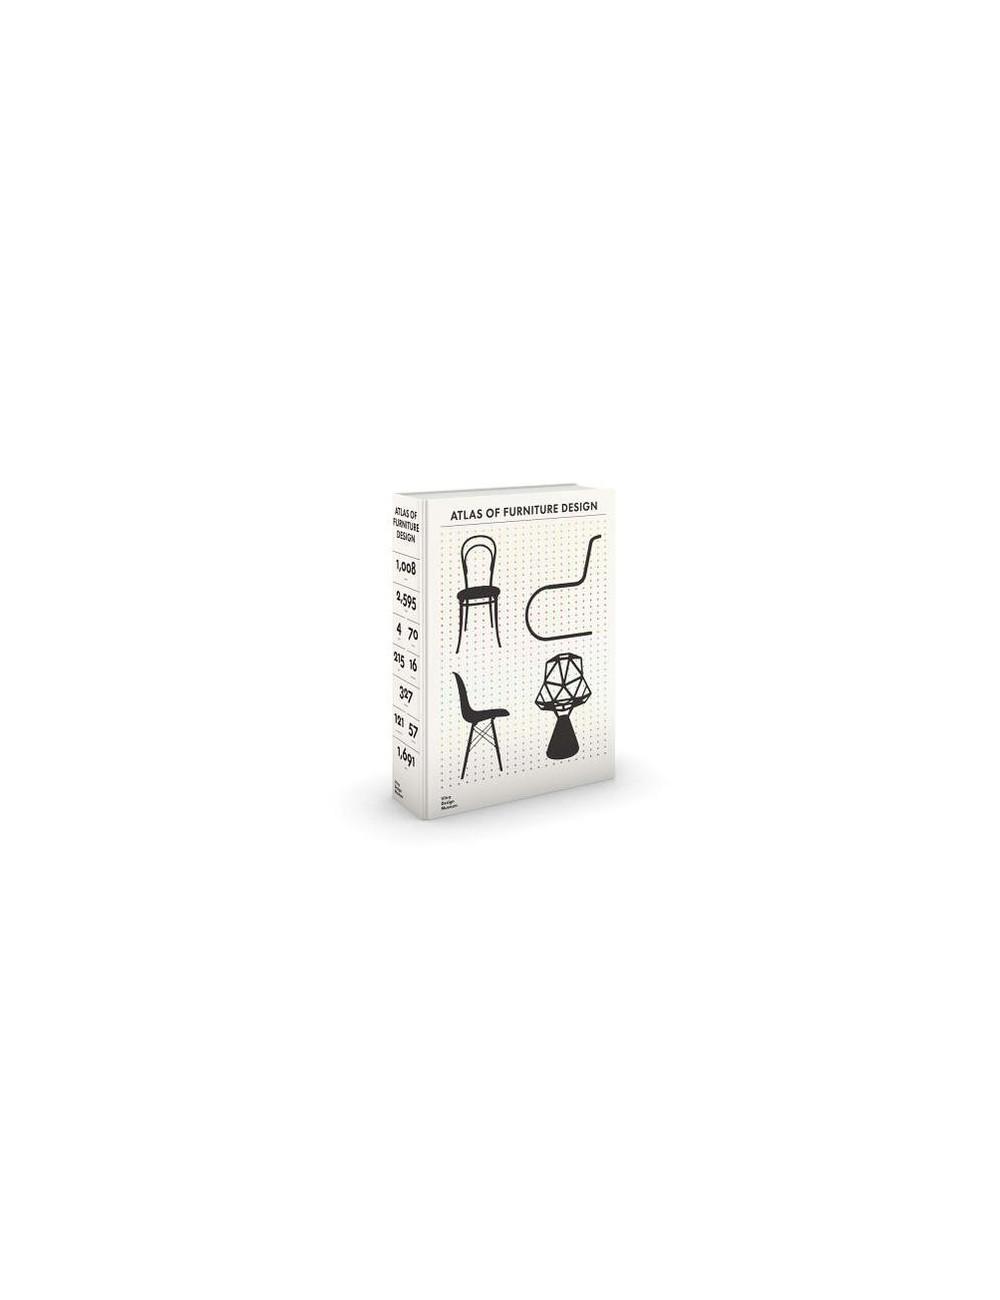 Boek Atlas of Furniture Design